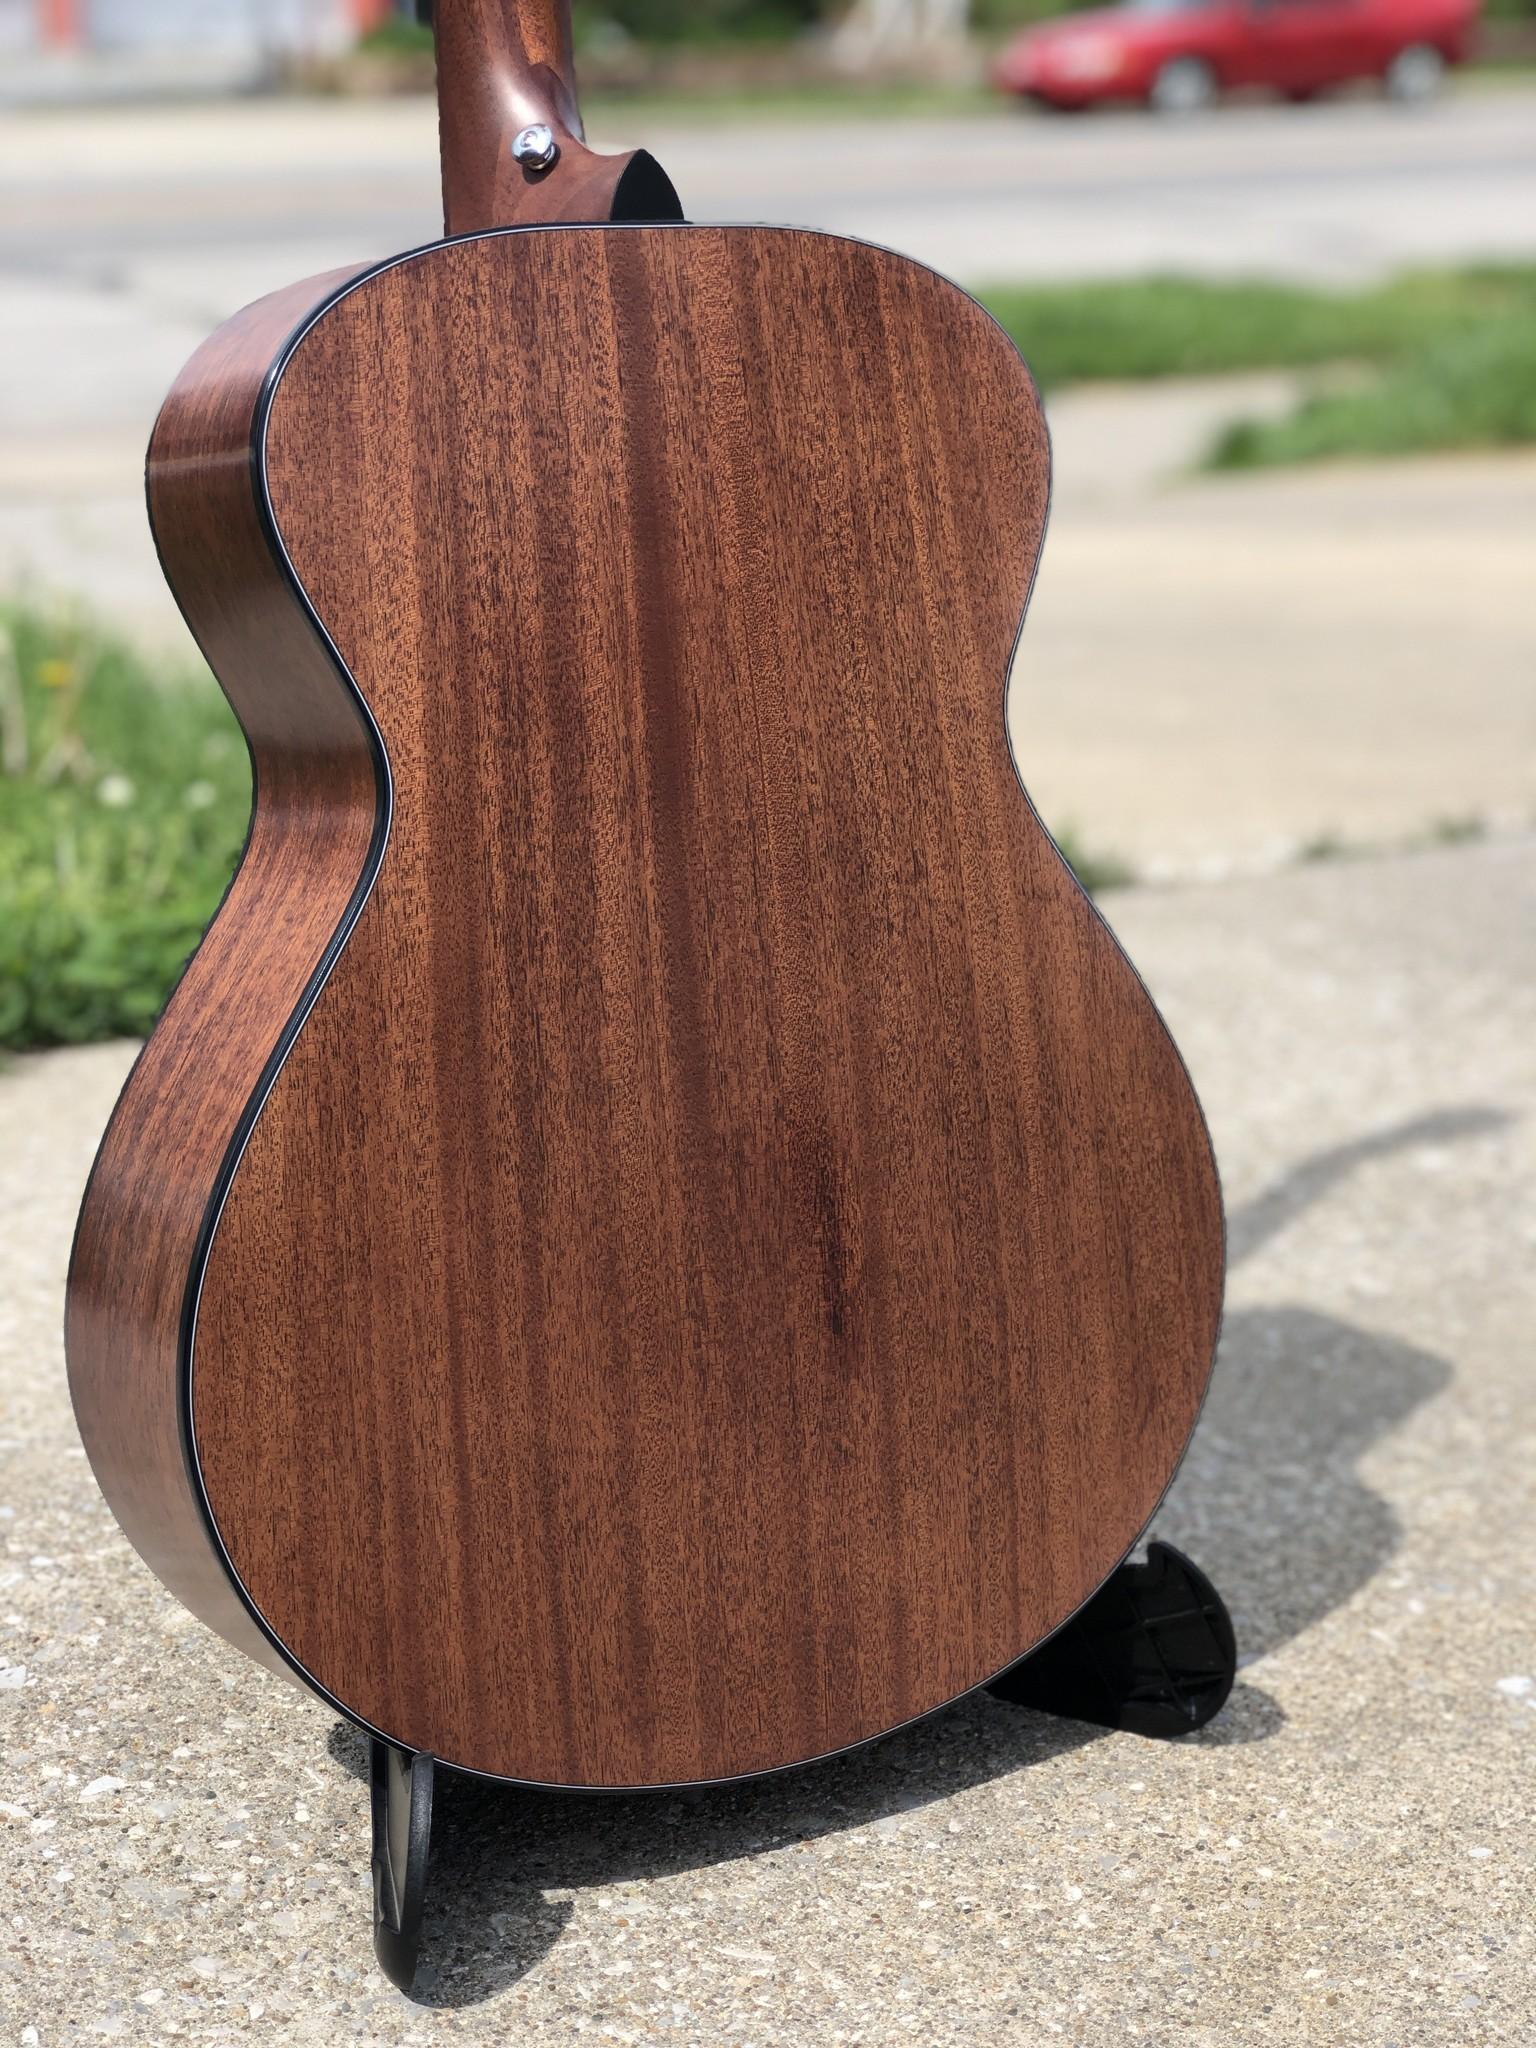 Breedlove Guitars Signature Concert Copper E Acoustic Electric-8